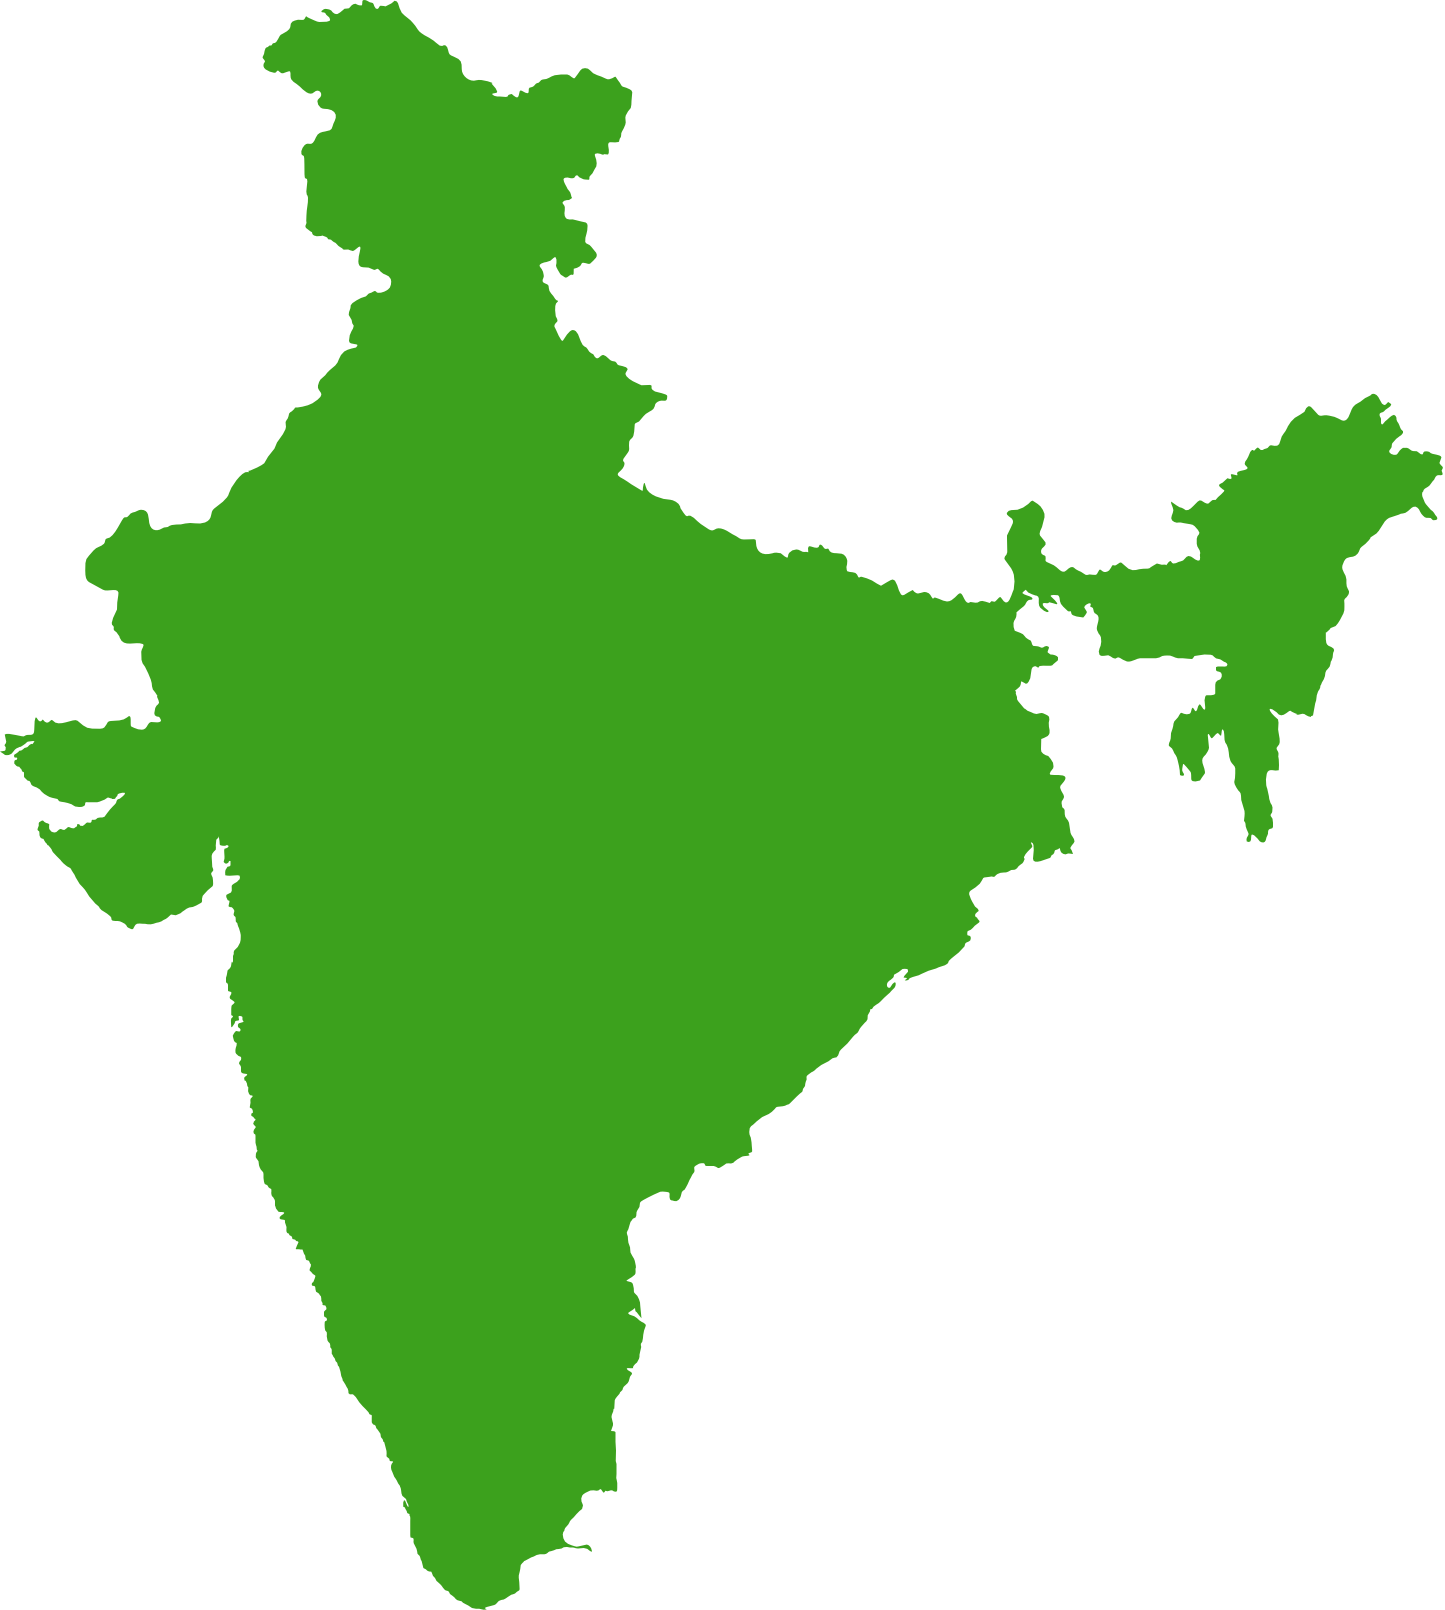 Png transparent images pluspng. India clipart map bharat